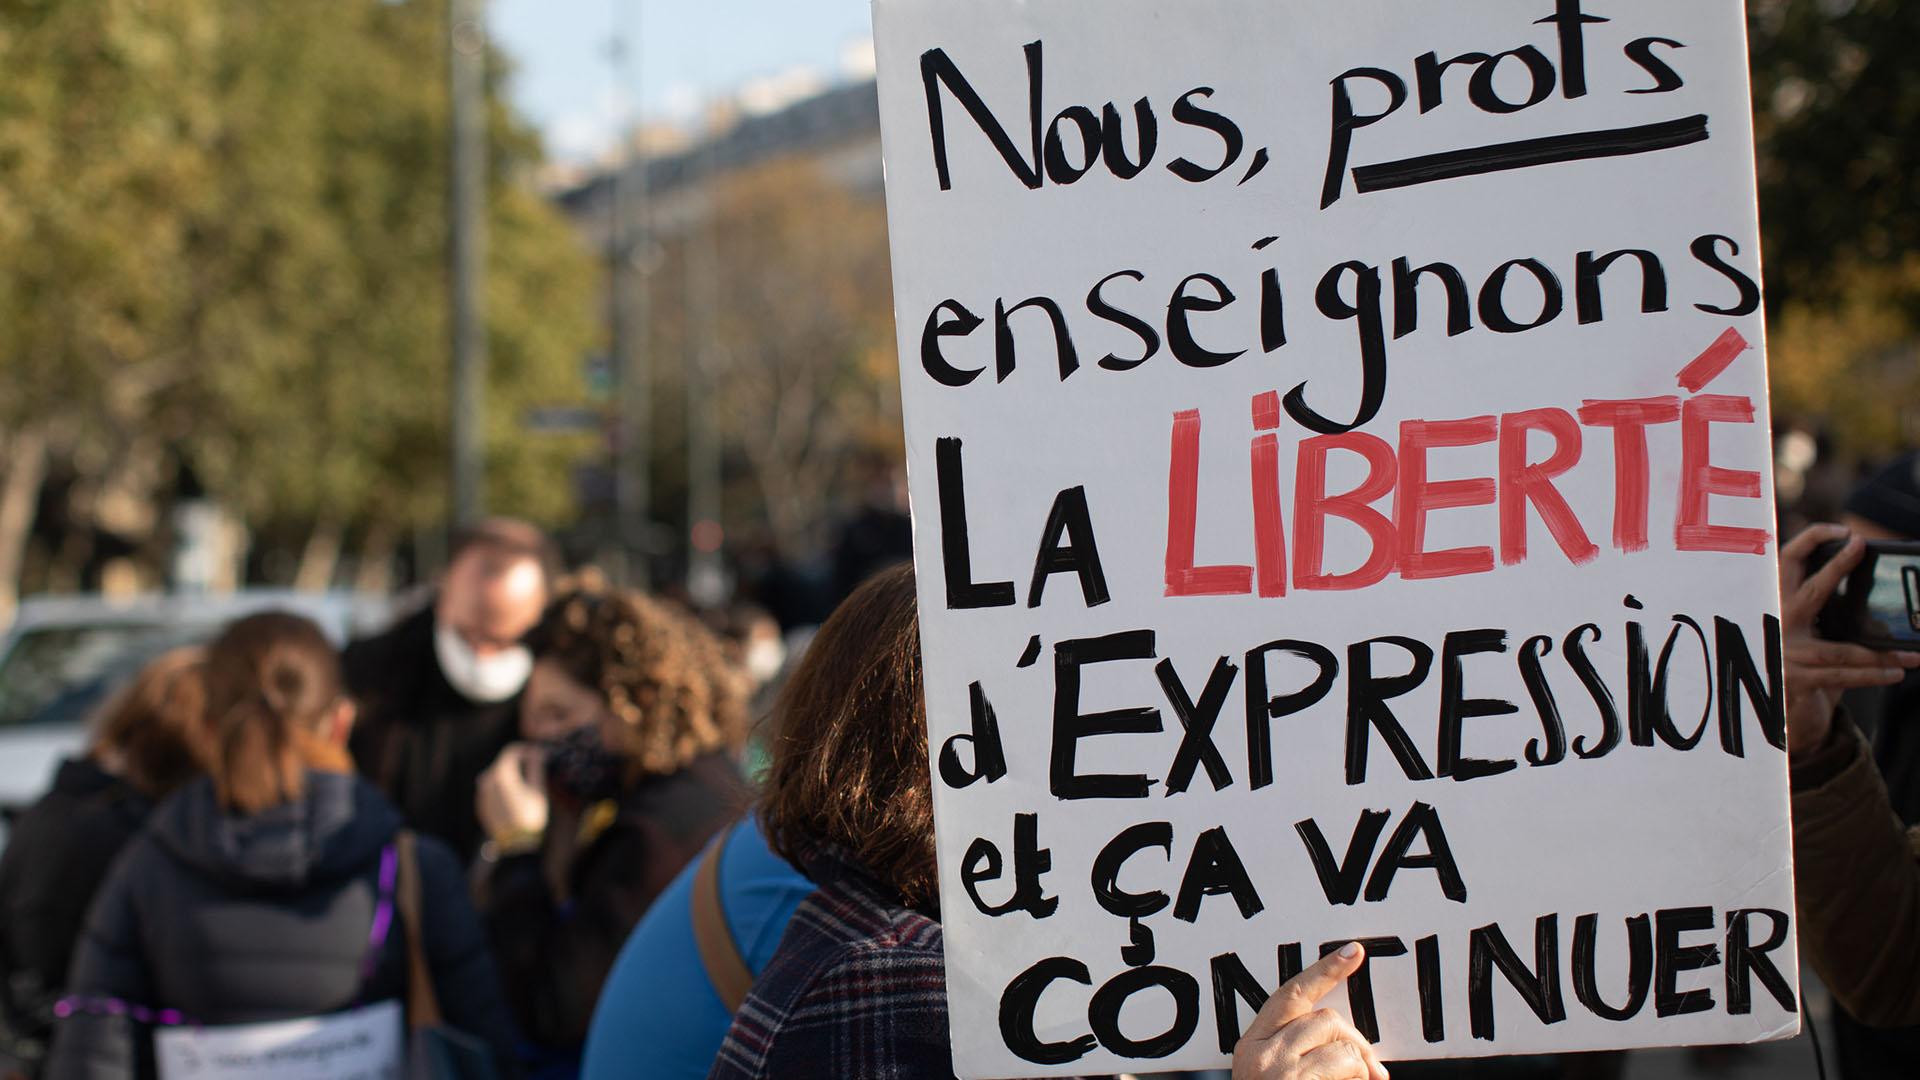 https://www.numerama.com/content/uploads/2020/10/manifestation-france-liberte-expression.jpg